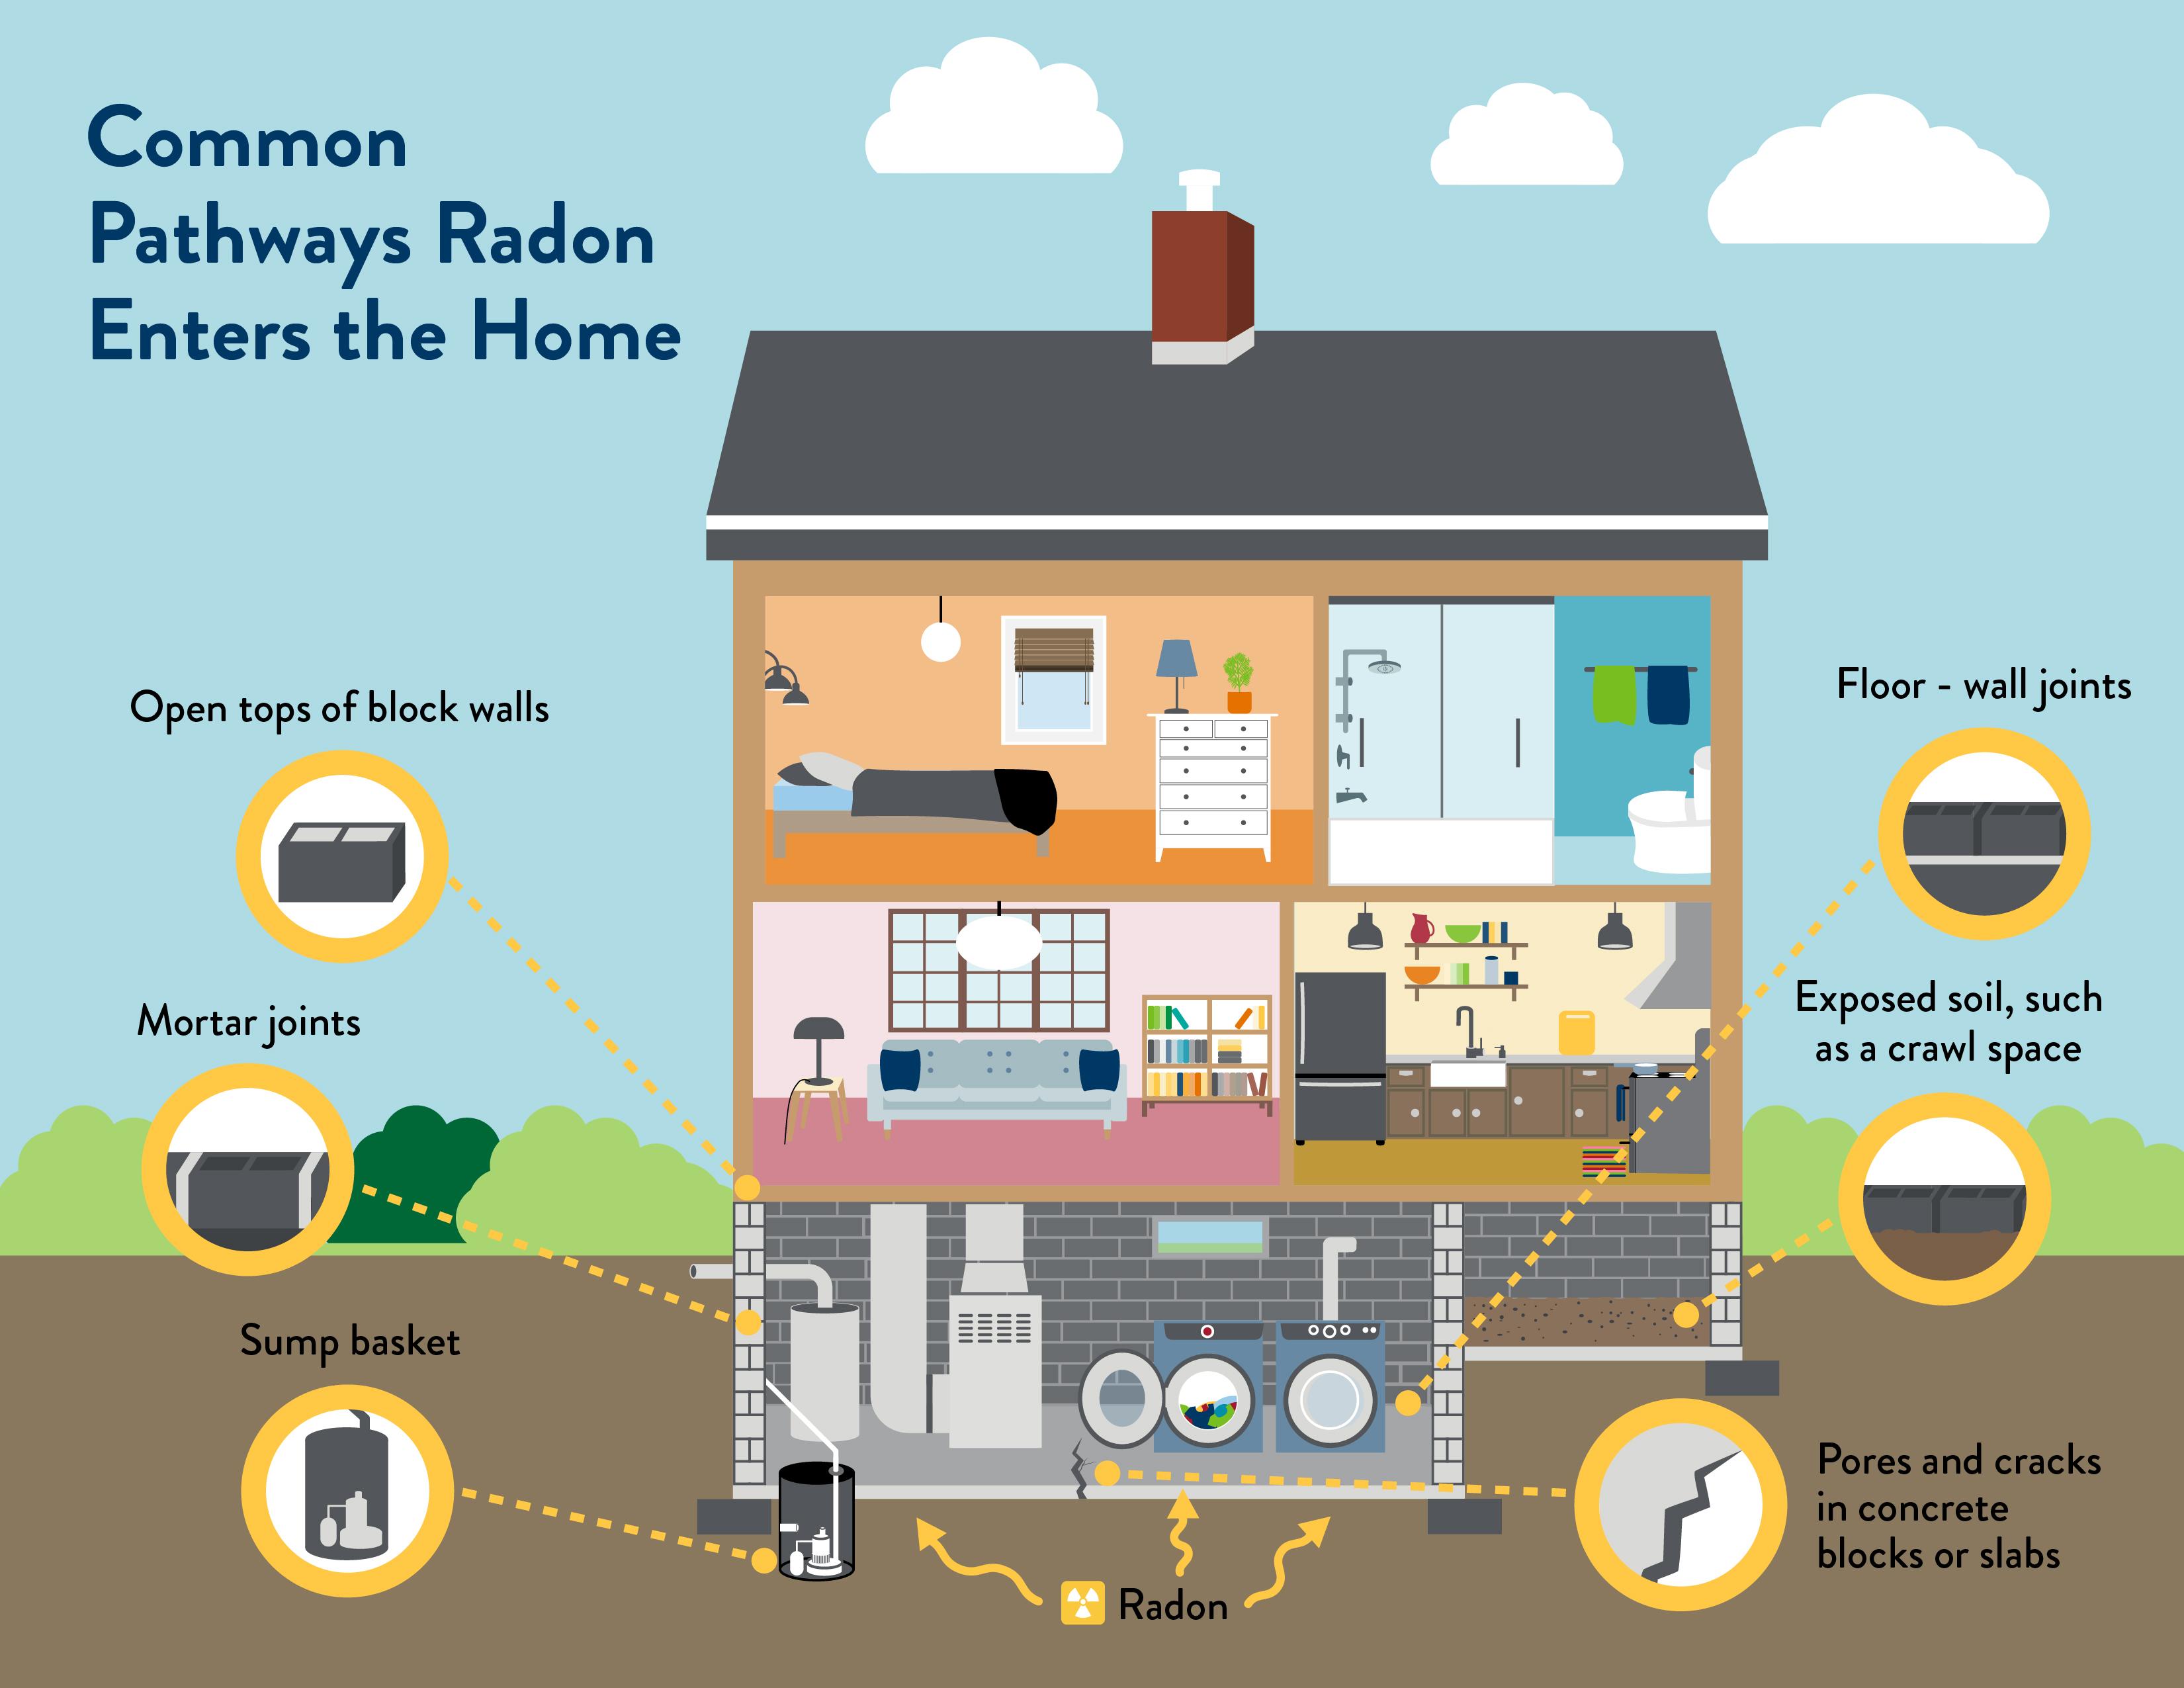 Radon Pathways Diagram